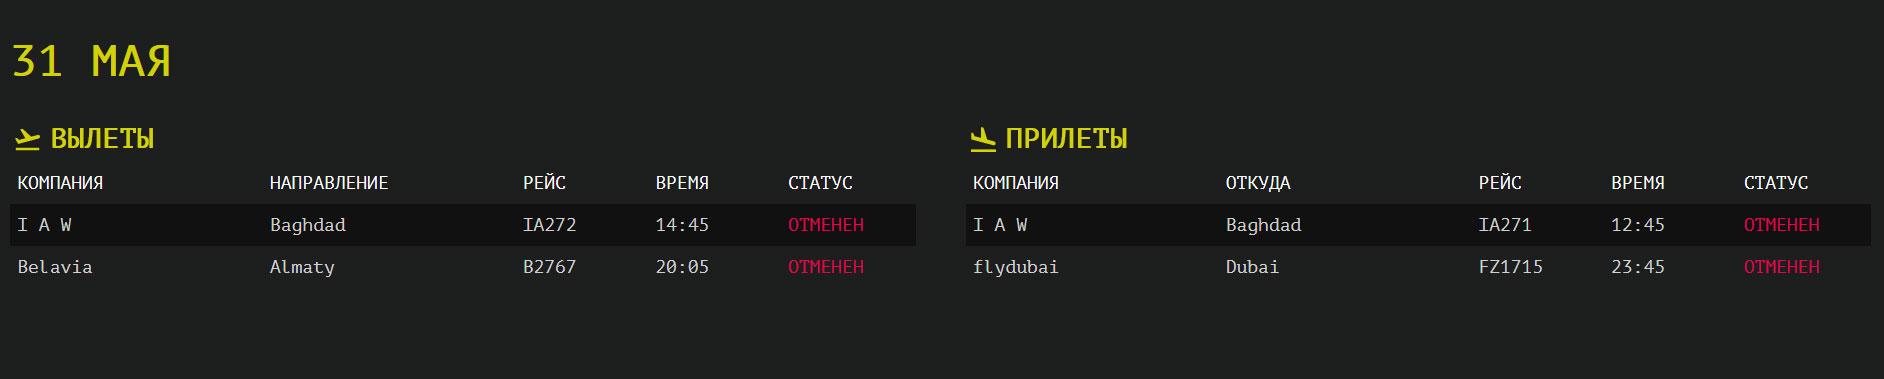 Беларусь - бесполетная зона4